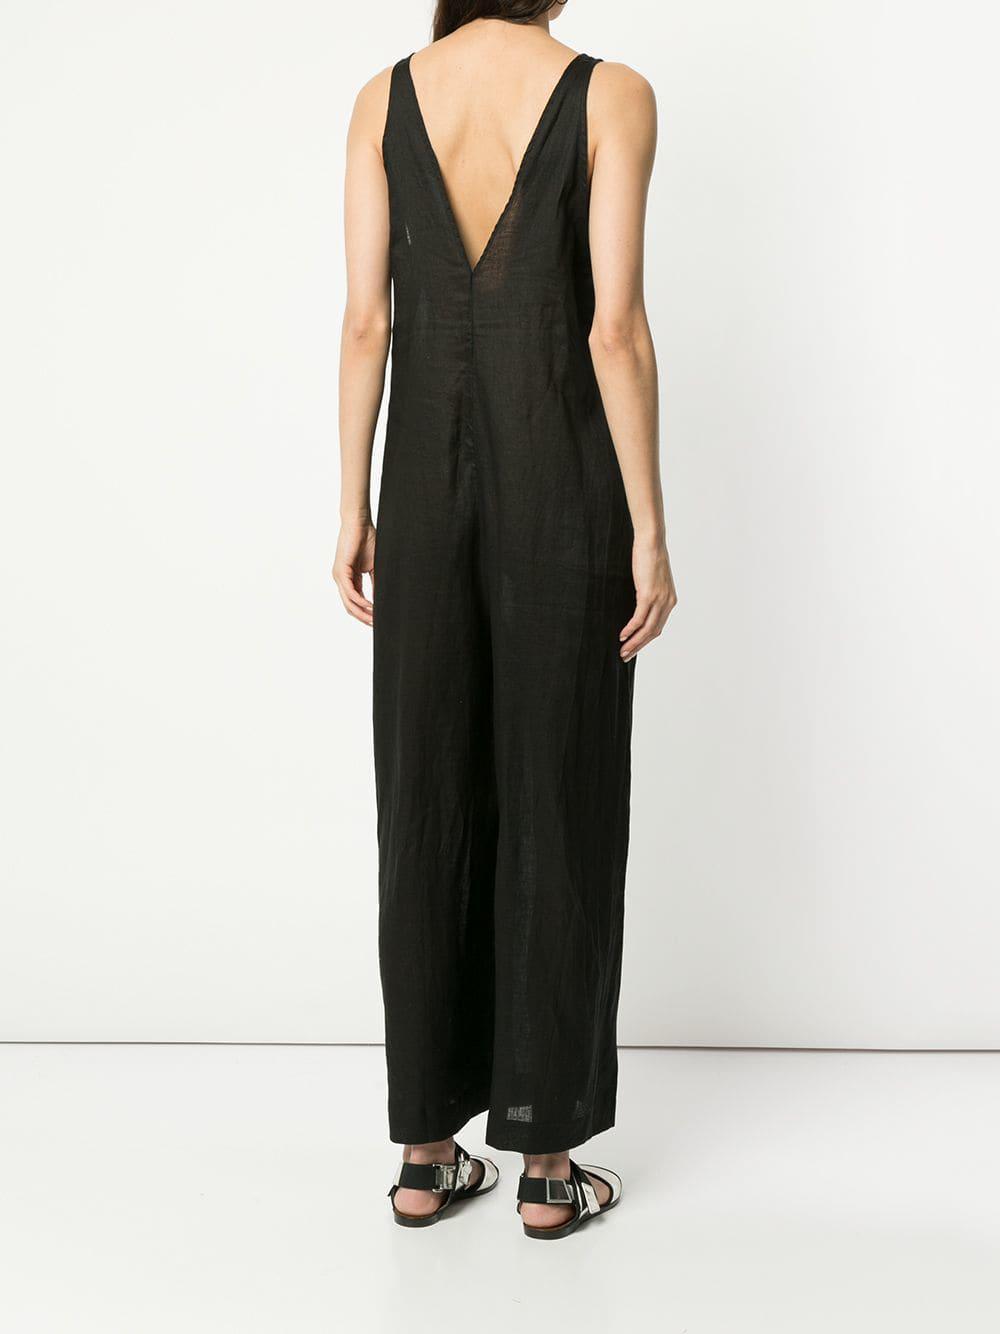 0ad4d59577 ... Black Sleeveless V-neck Jumpsuit - Lyst. View fullscreen